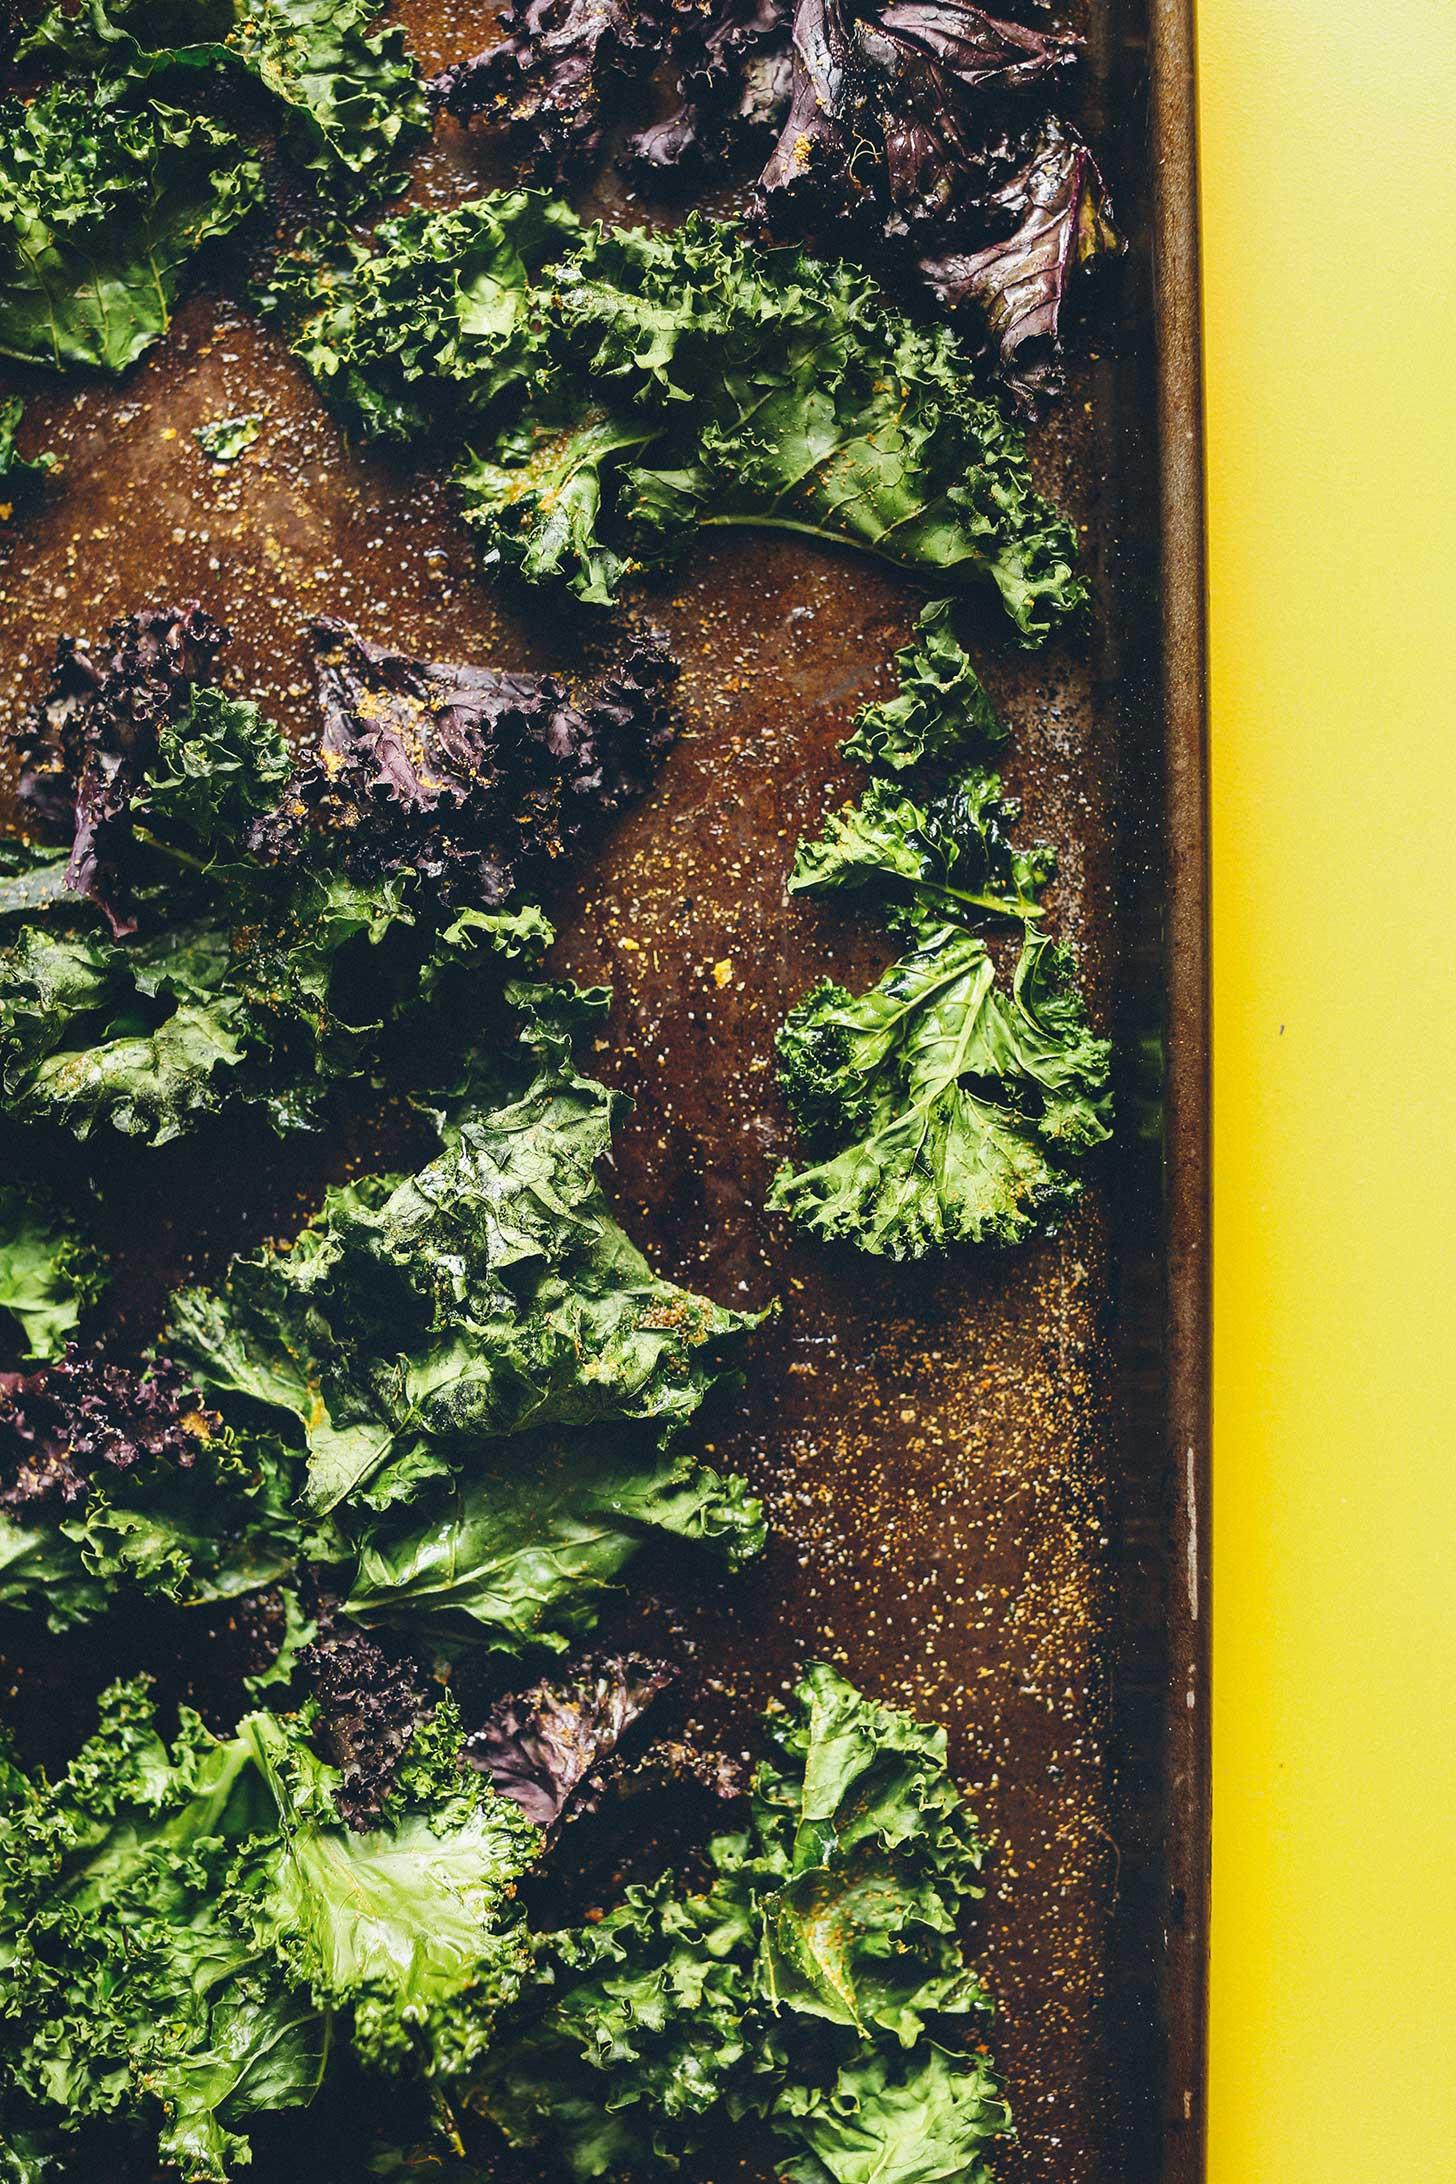 Perfectly crispy vegan kale chips on a baking sheet